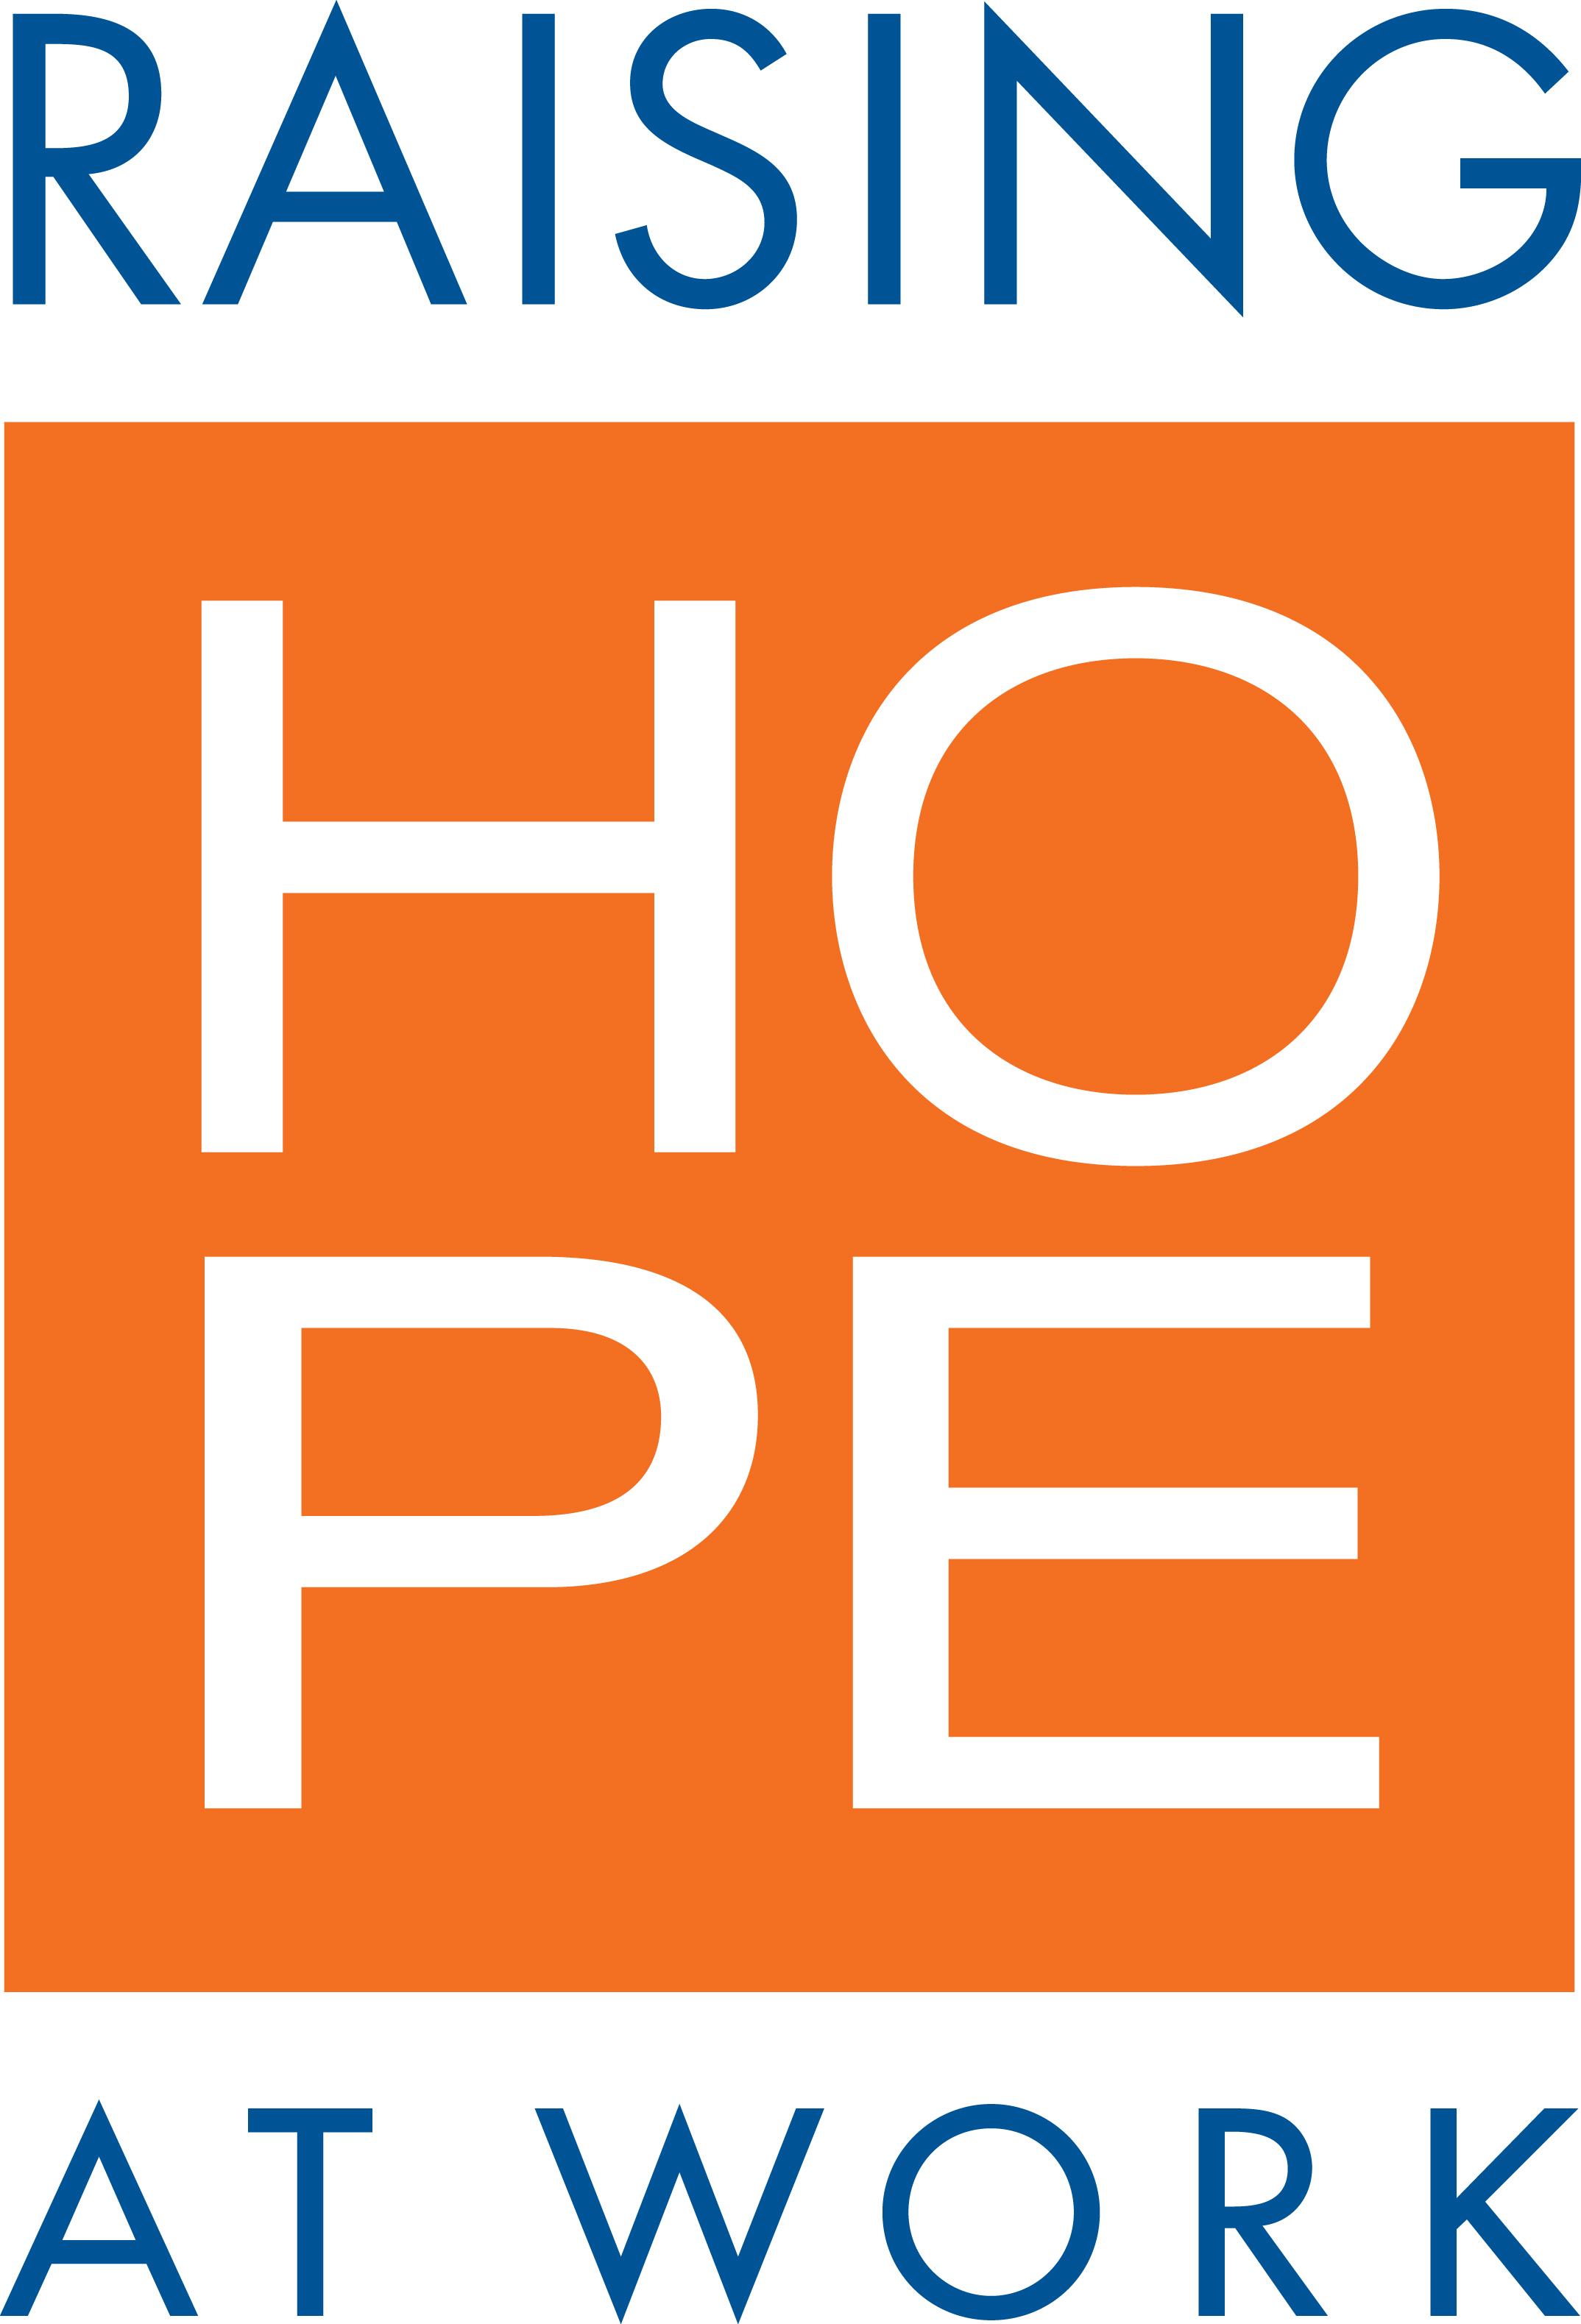 Raising-Hope-at-Work-logo_F